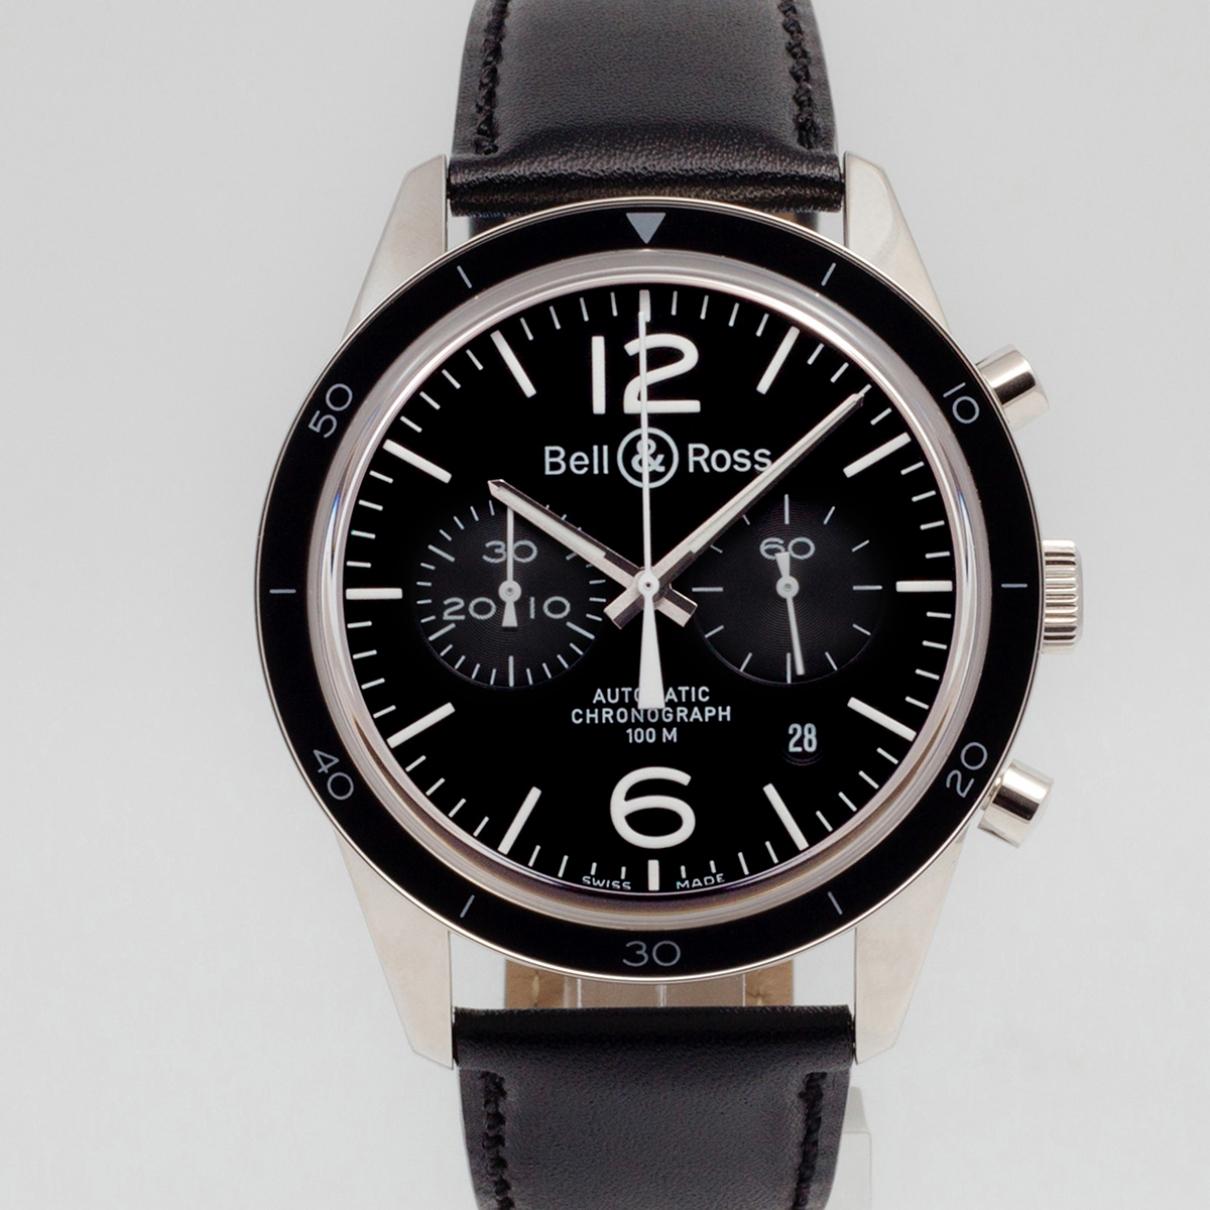 Relojes BR126 Bell & Ross